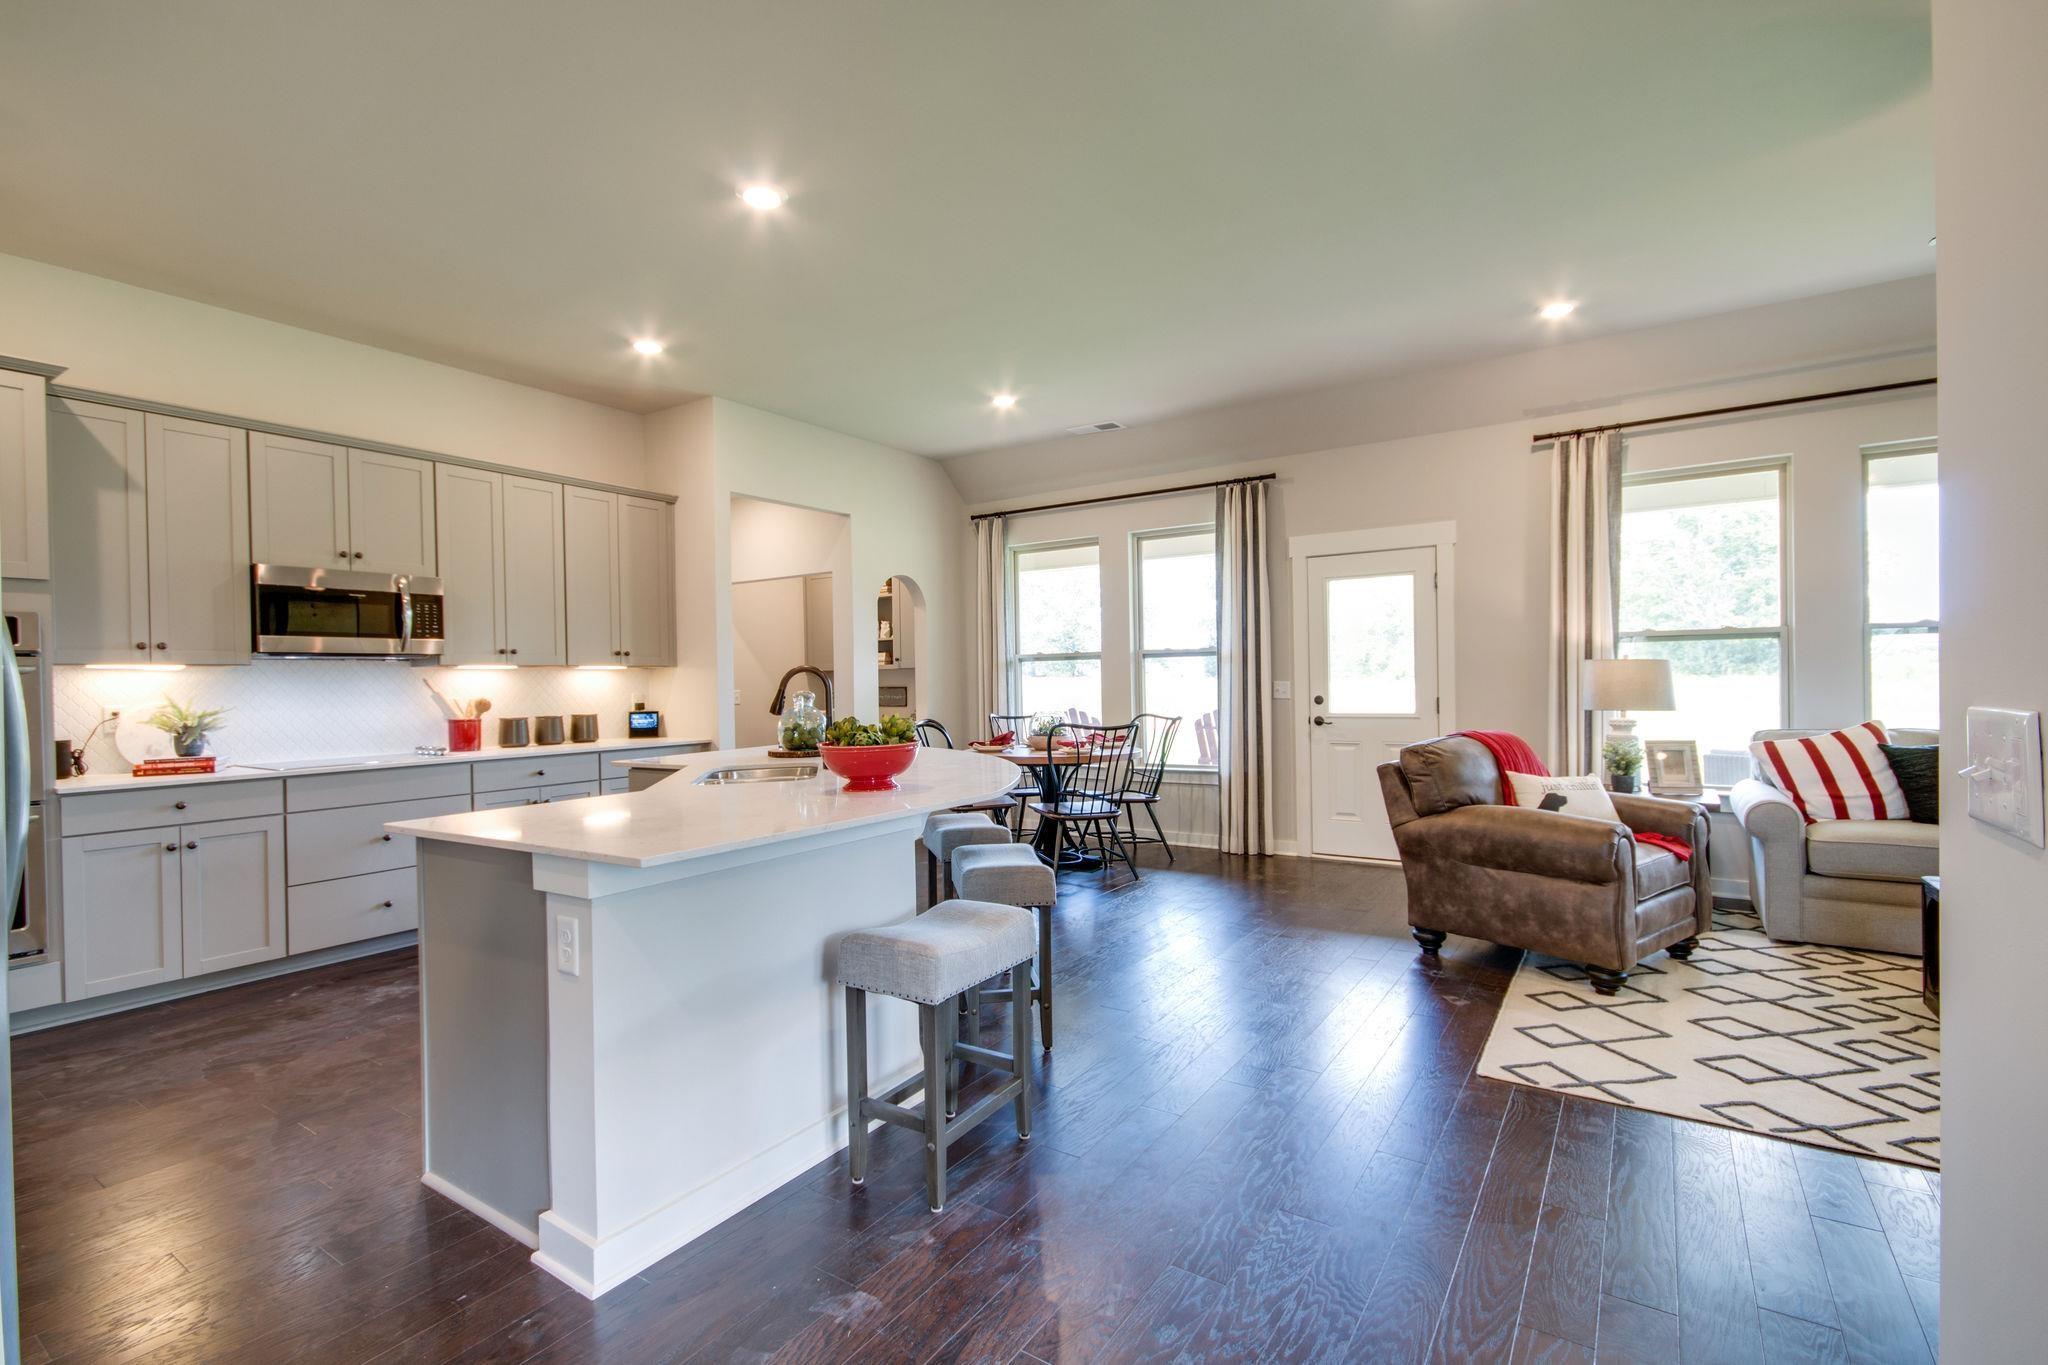 4726 Lapis Lane Lot 226C, Murfreesboro, TN 37128 - Murfreesboro, TN real estate listing